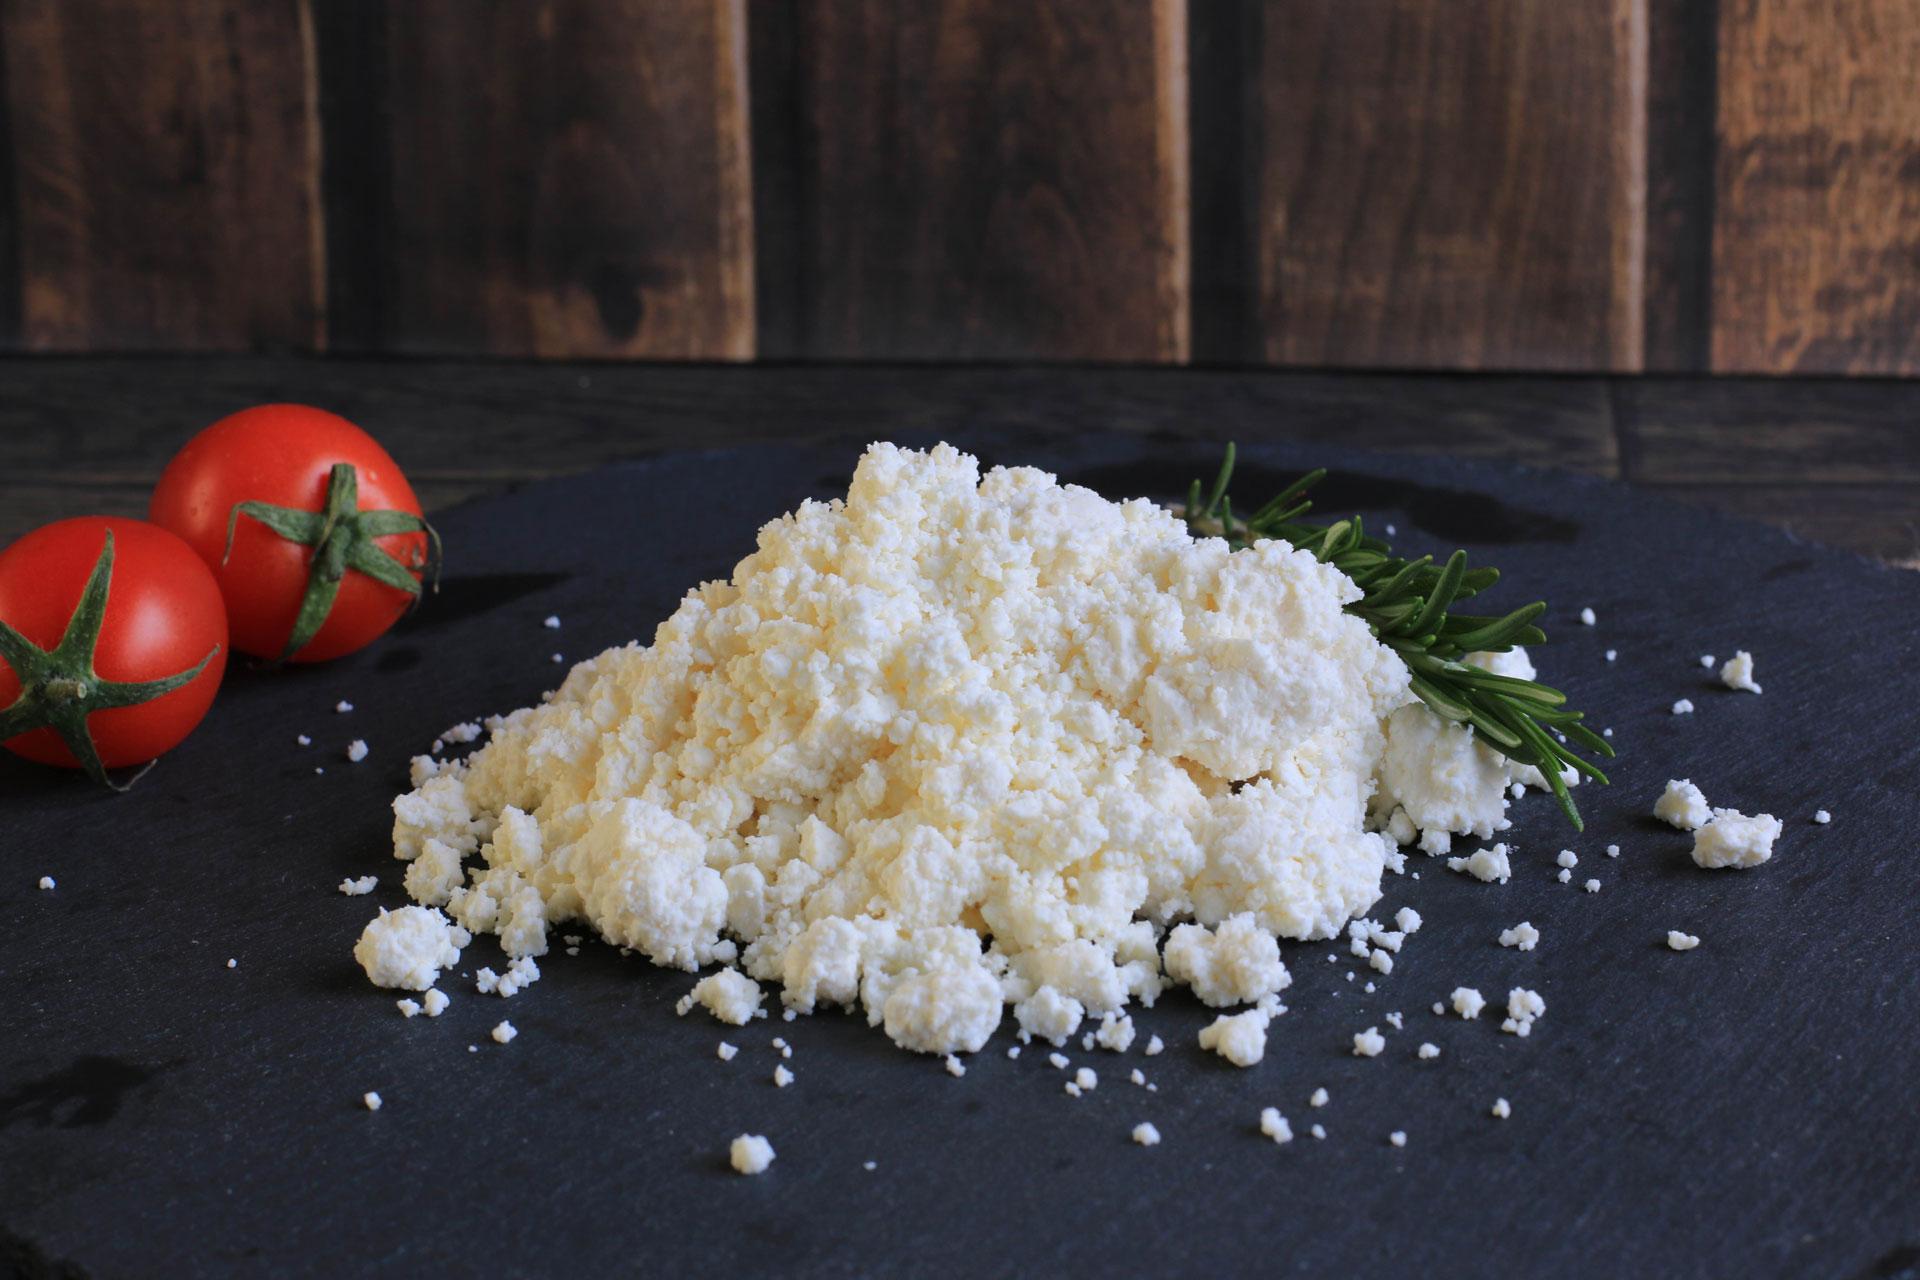 Delicious Lor Cheese. (Image Credit-Ozer Ciftlik)